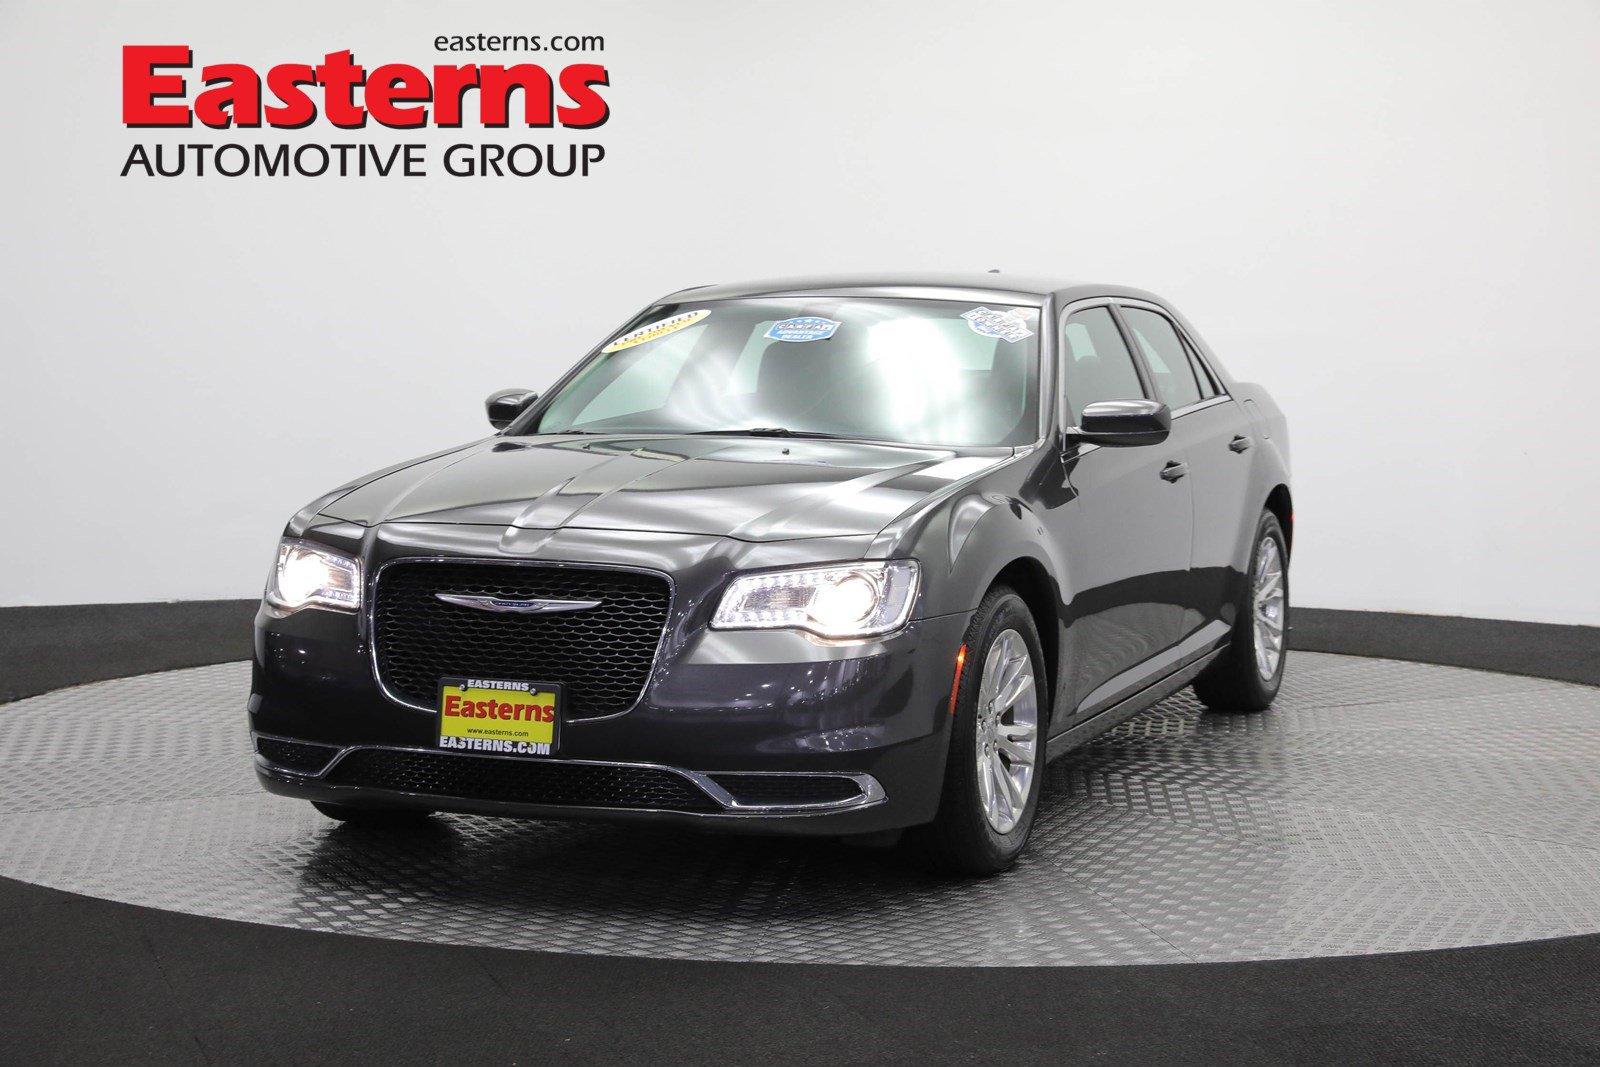 2016 Chrysler 300 Limited image